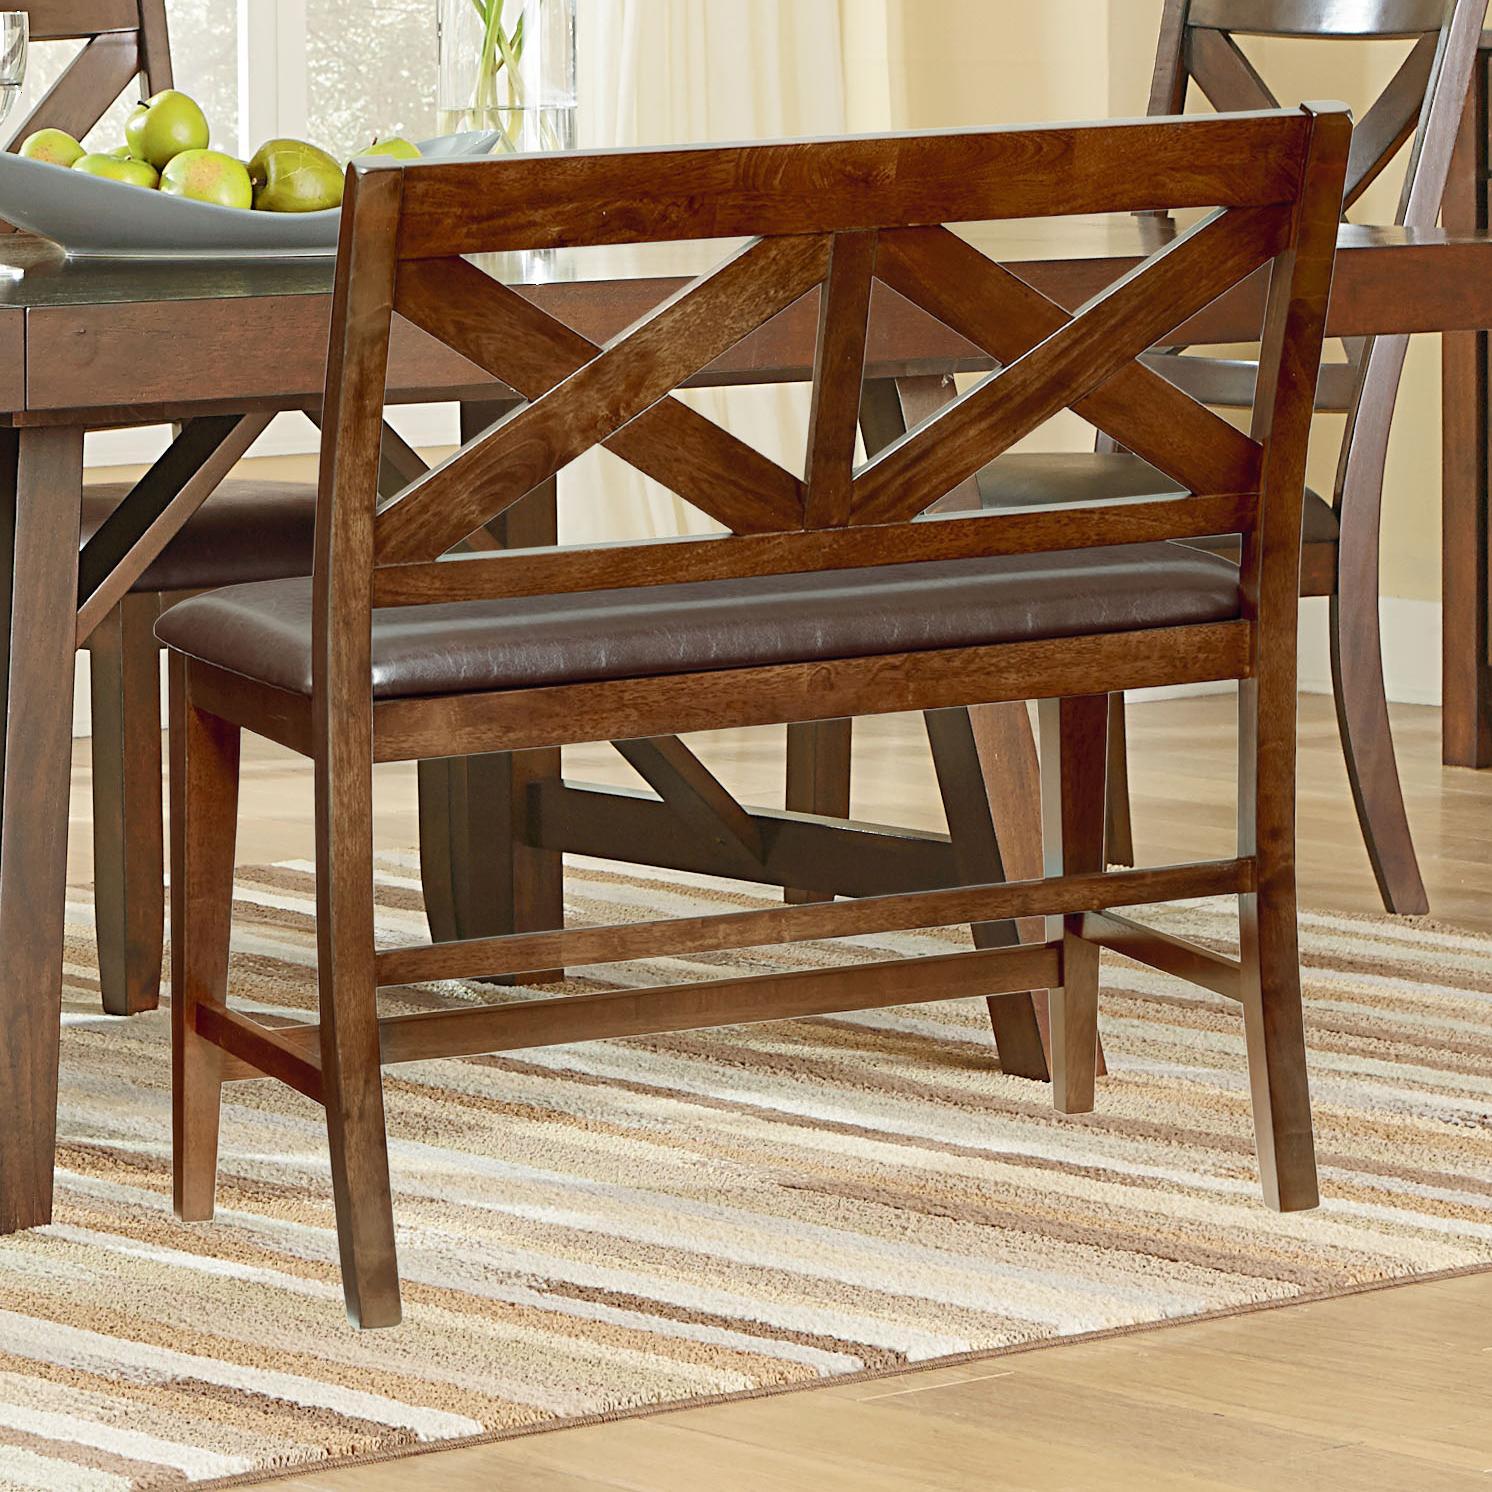 Standard Furniture Omaha Brown Dining Bench - Item Number: 16189